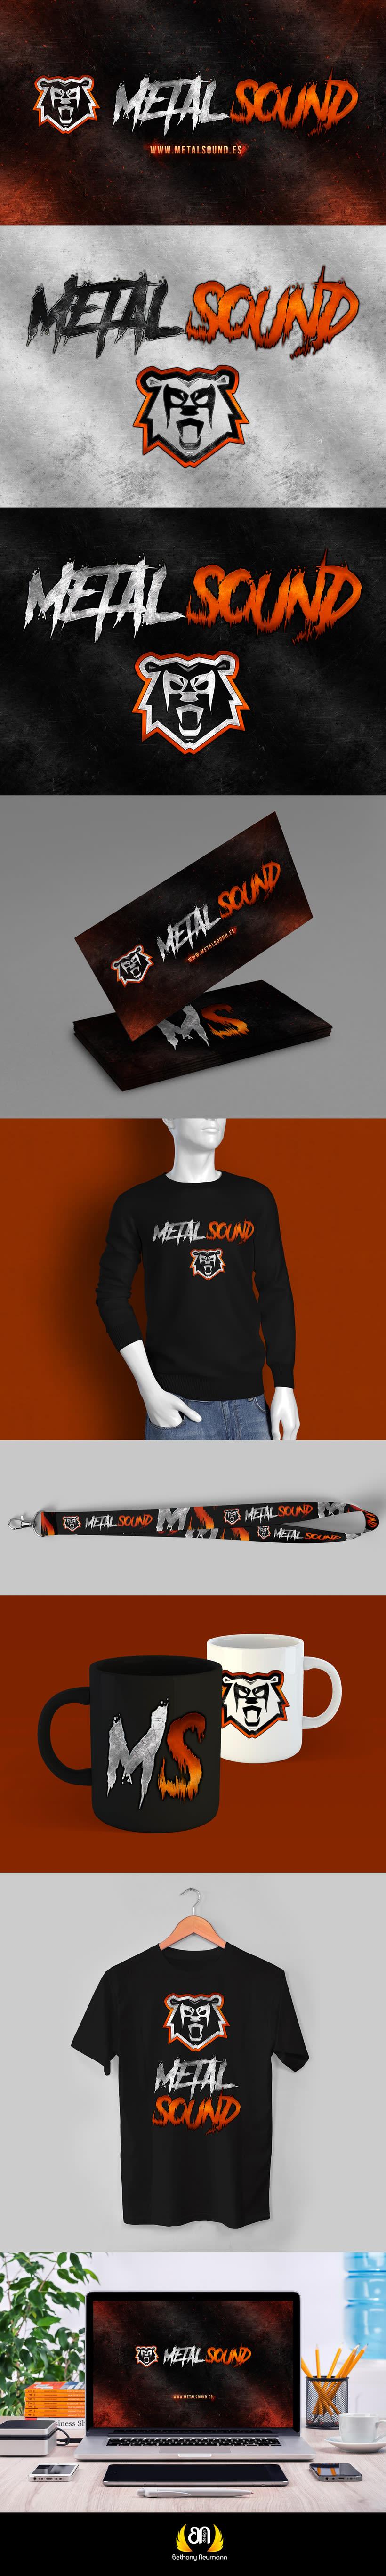 Metal Sound - Webzine -1